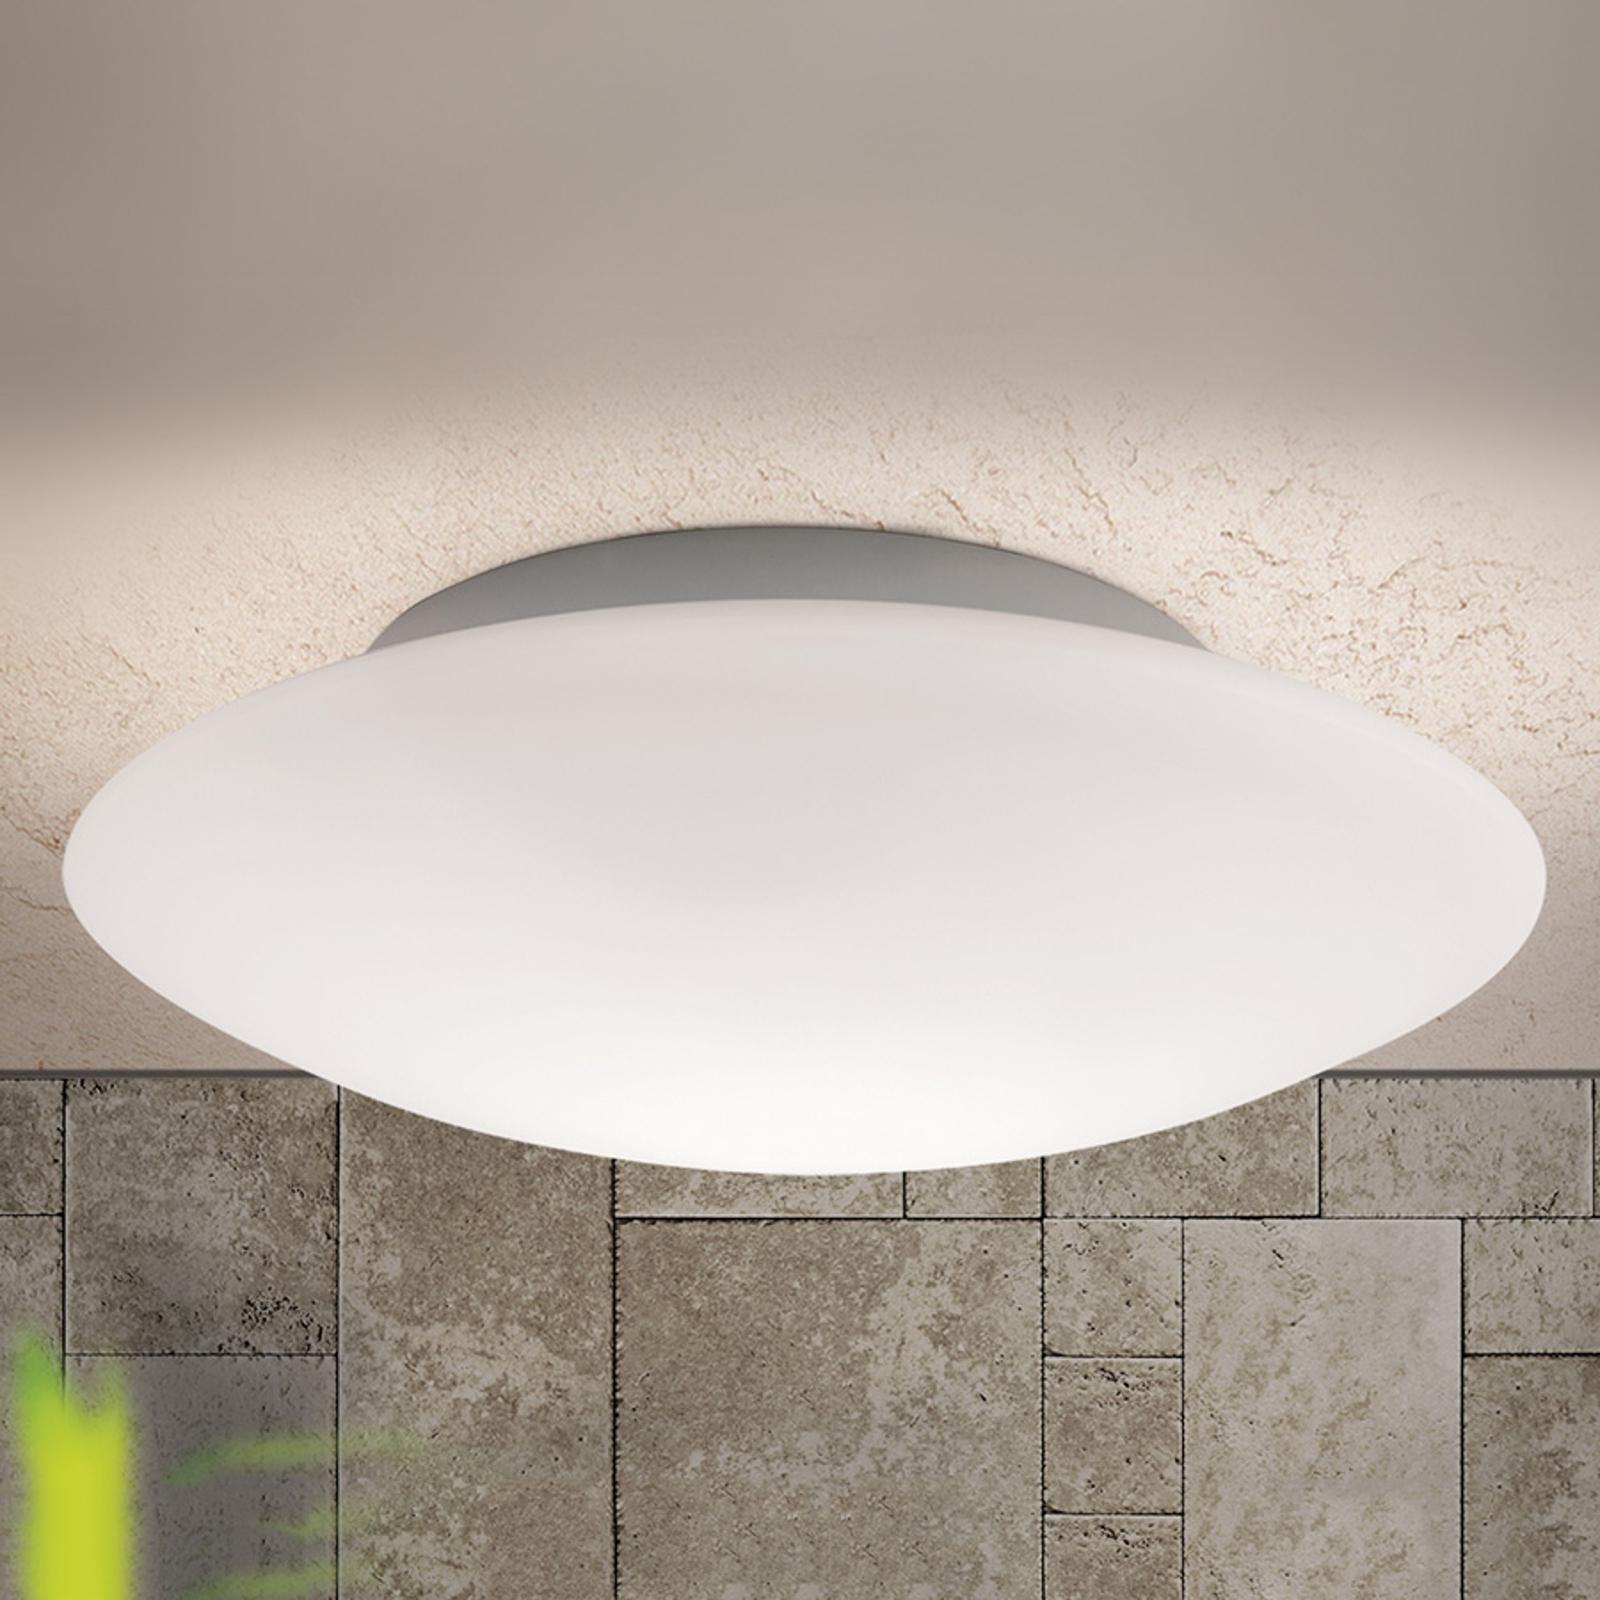 Szklana lampa sufitowa OPAL, 45 cm